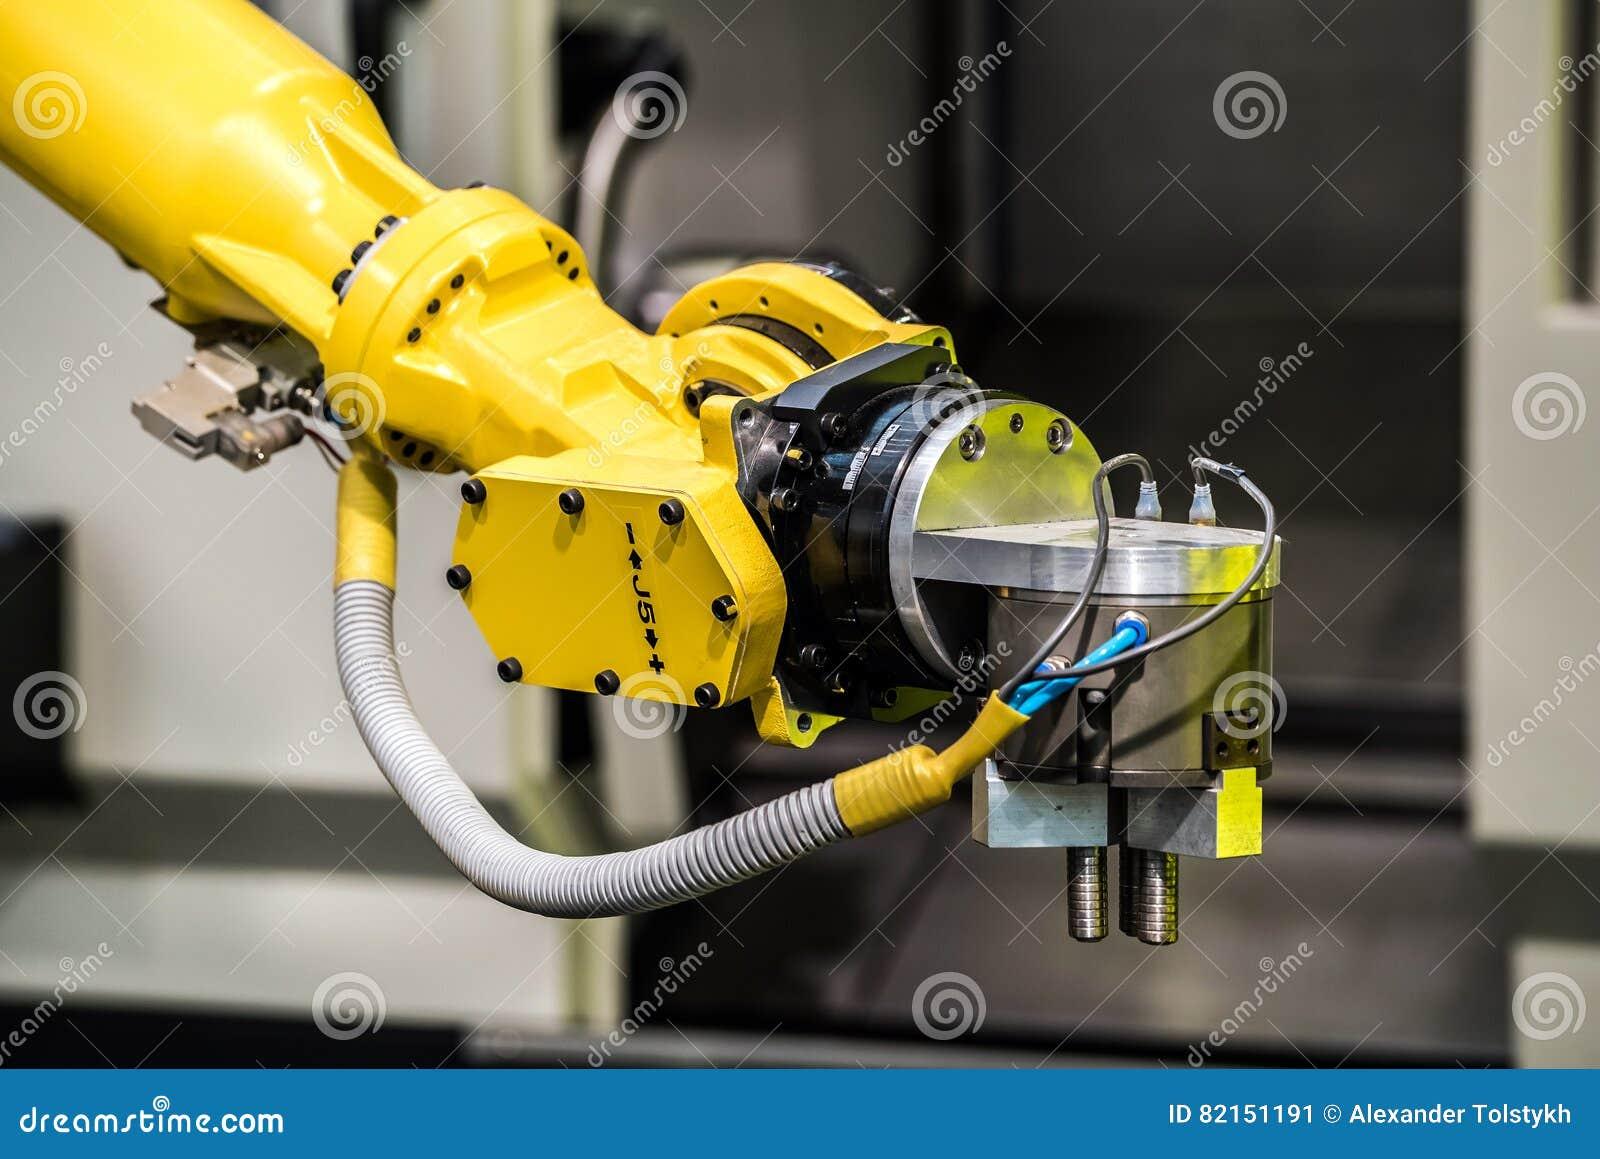 Machine de robot industriel